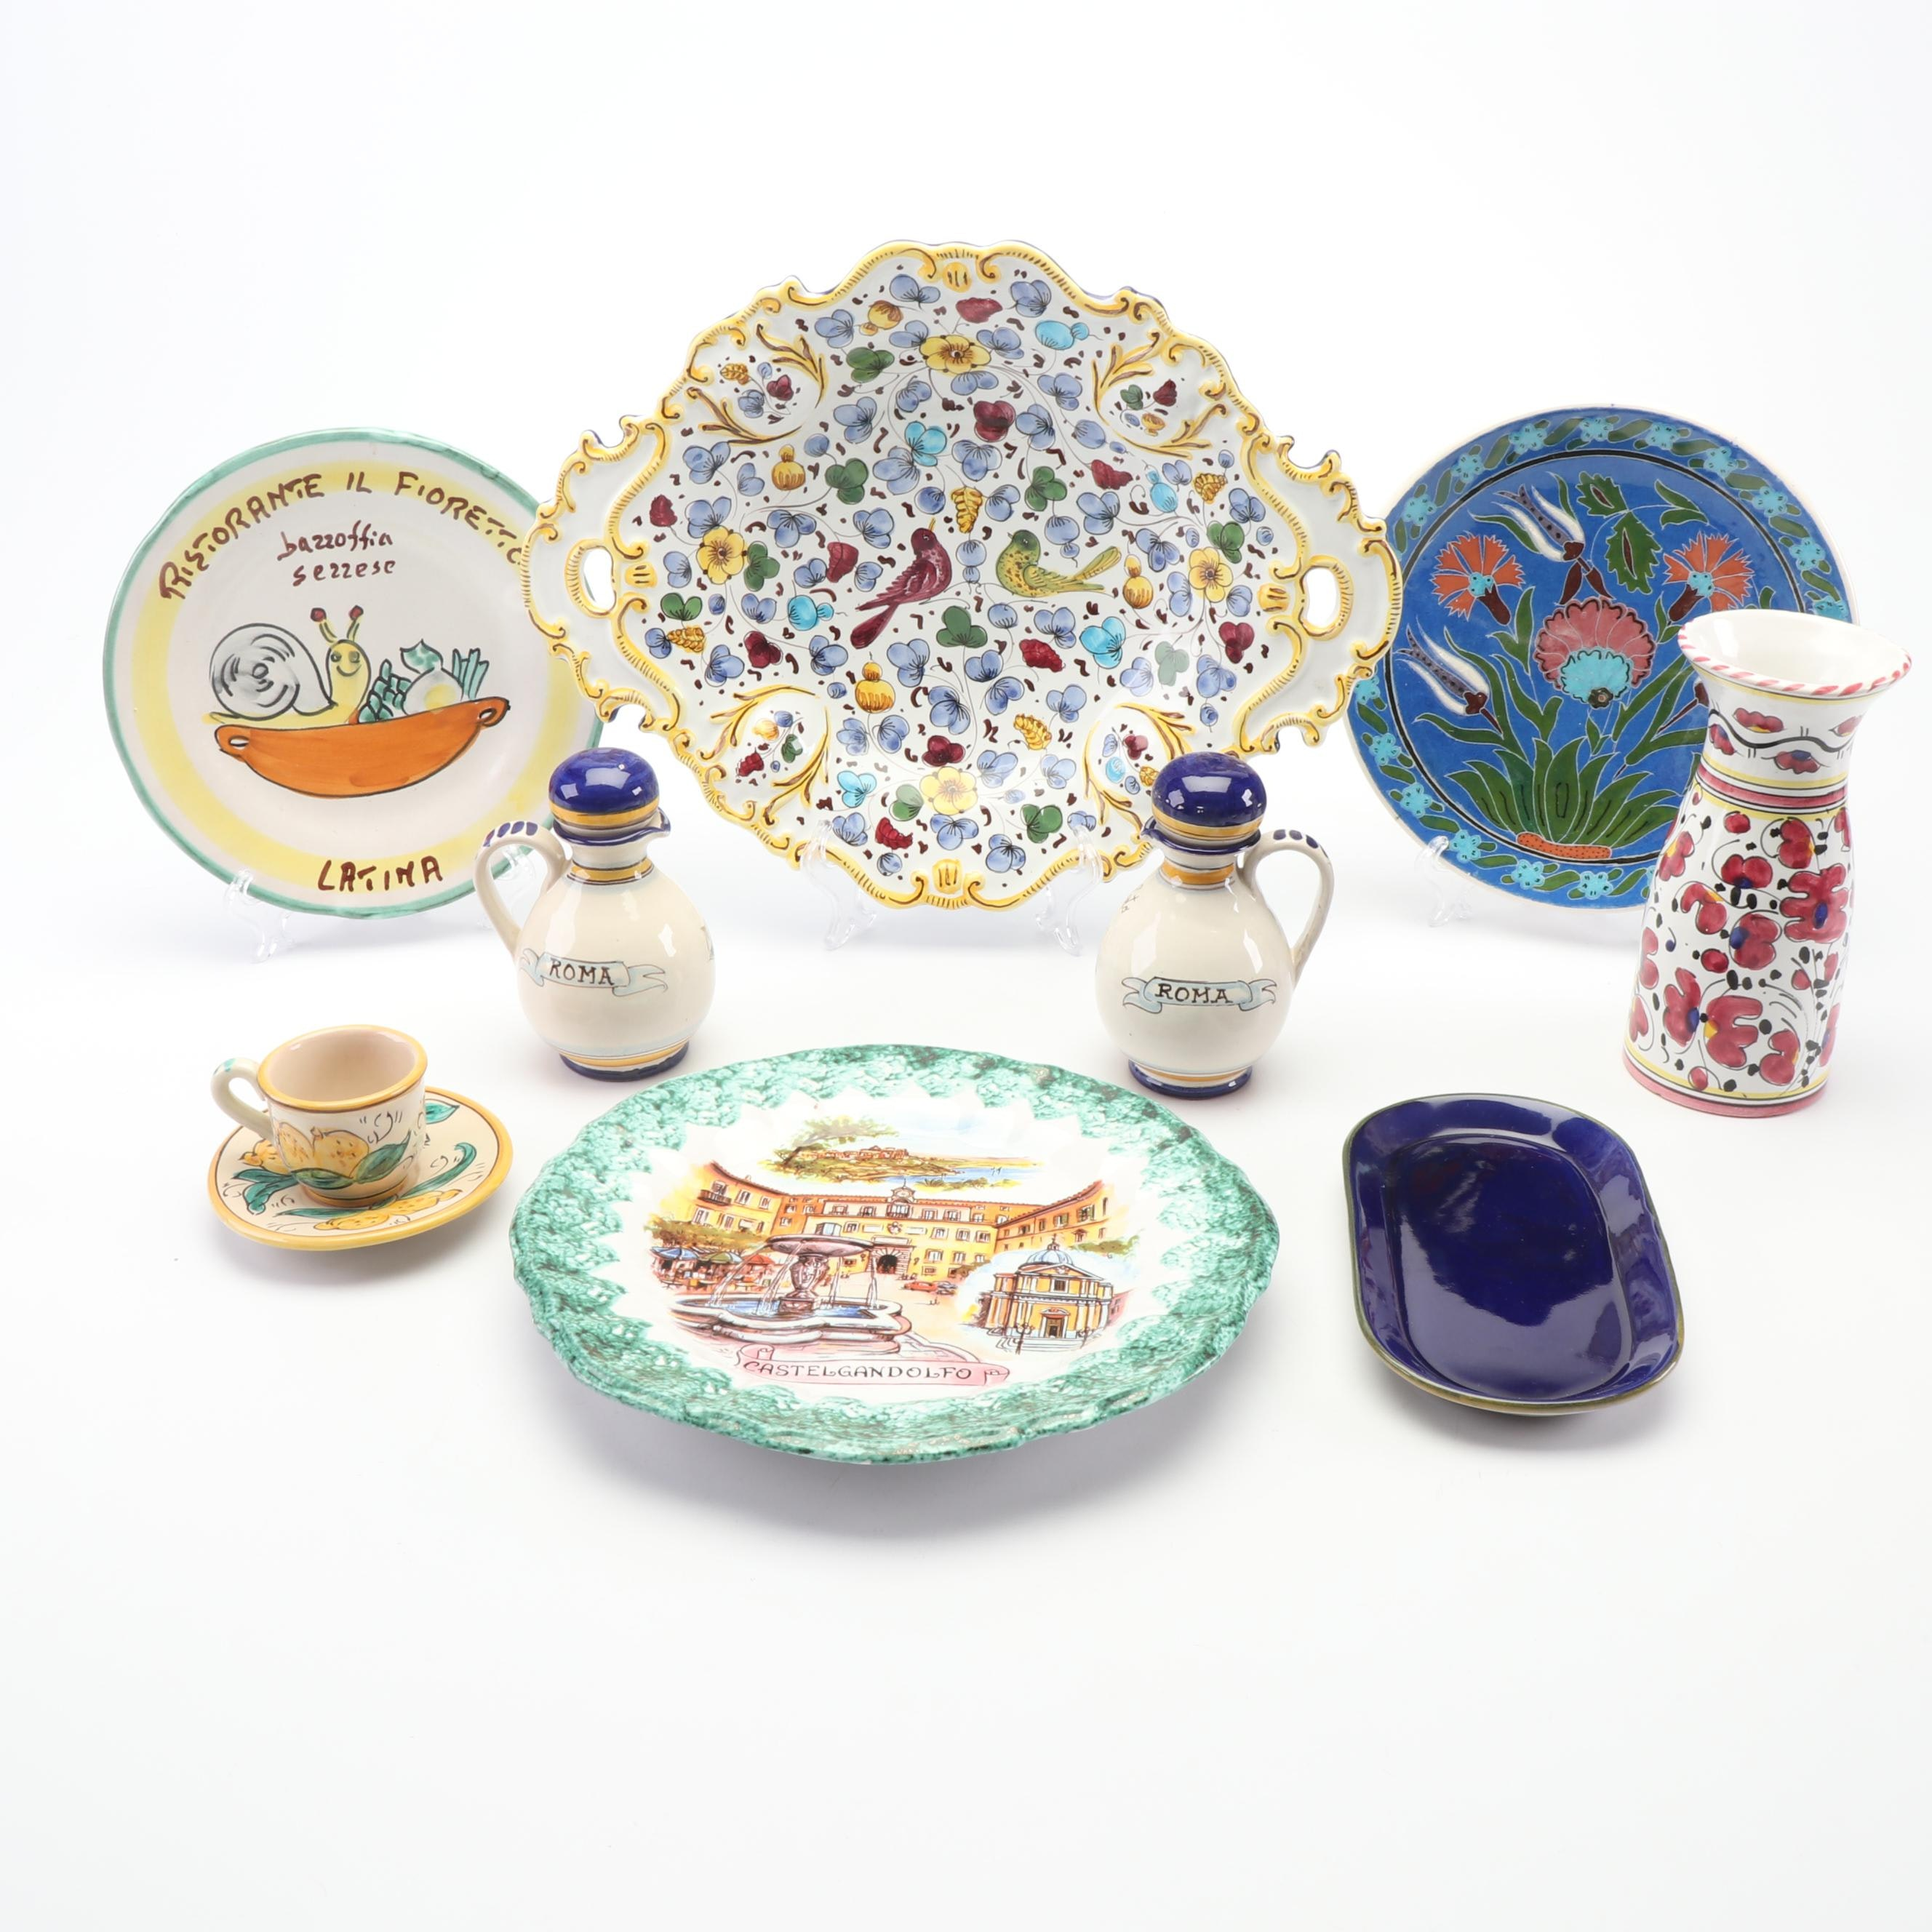 Italian Hand-Painted Faïence Dinnerware Featuring Deruta and Kütahya